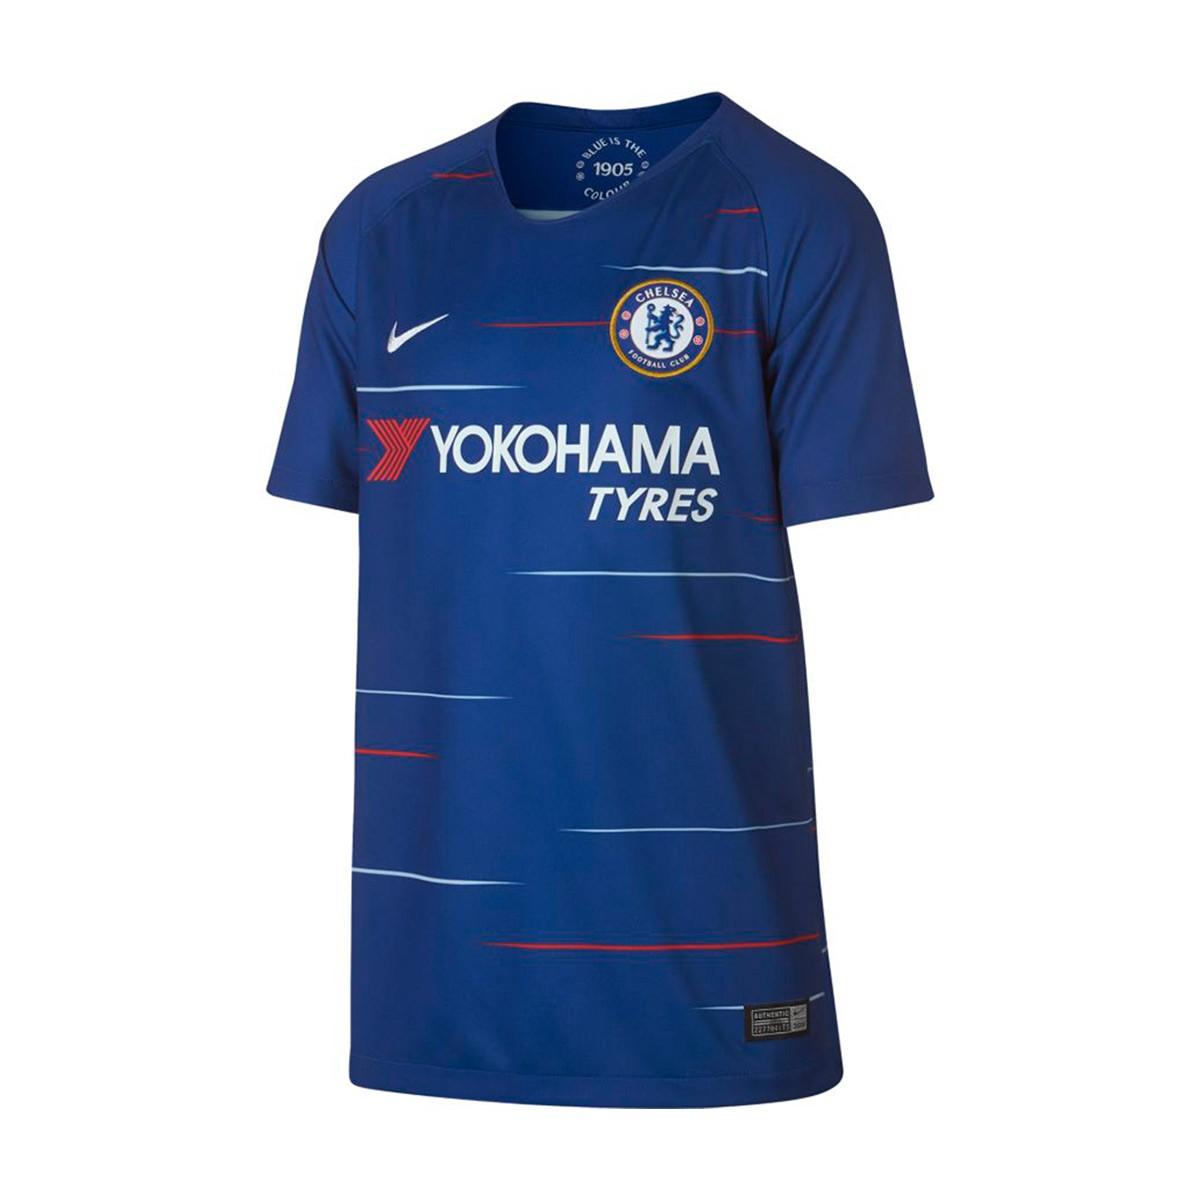 Camiseta Nike Chelsea FC Stadium Primera Equipación 2018-2019 Niño Rush  blue-White - Soloporteros es ahora Fútbol Emotion 3ecfdeef67204